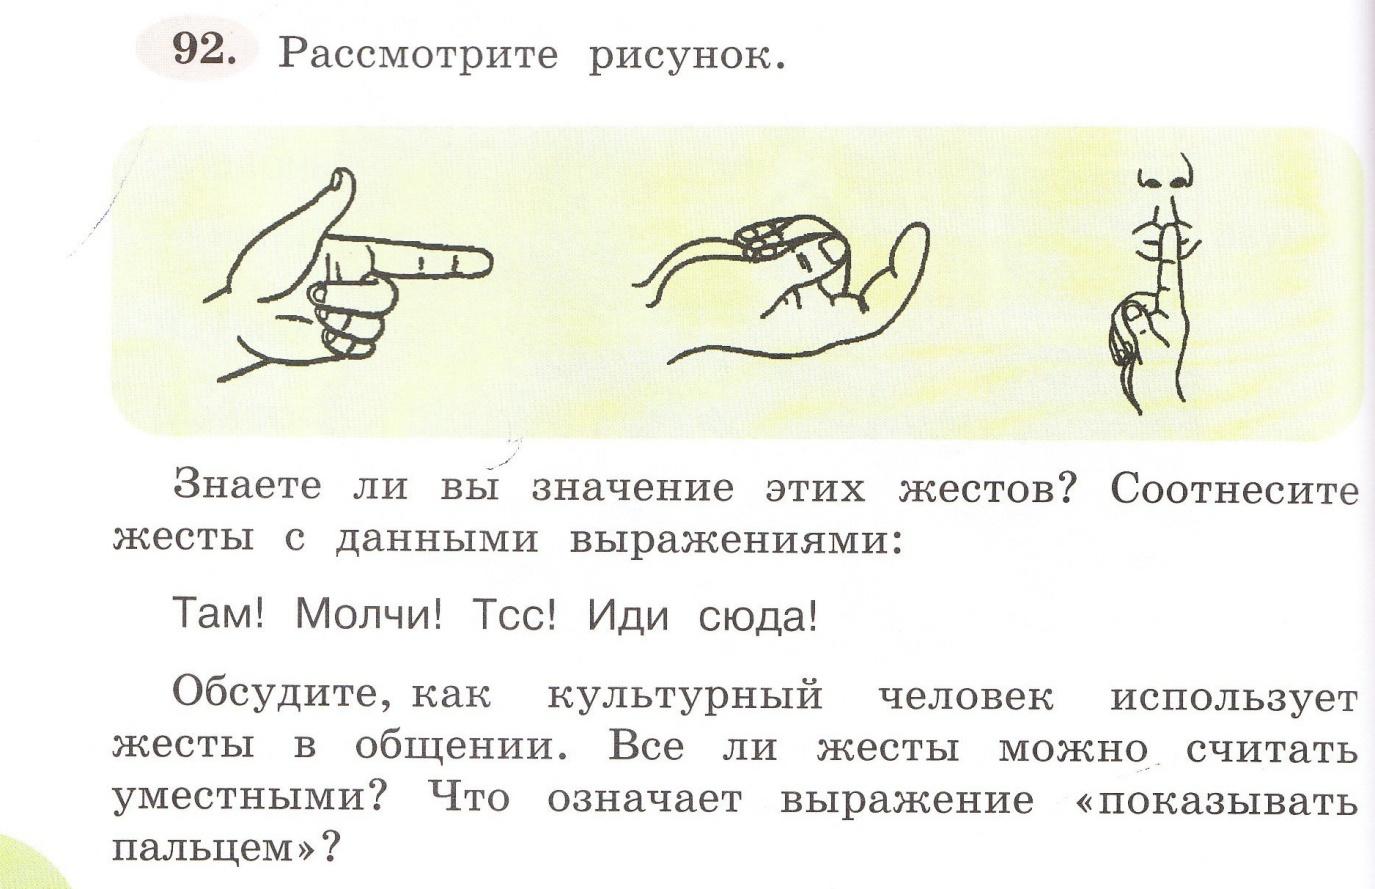 H:\Documents and Settings\Лена\Мои документы\Мои рисунки\MP Navigator EX\2012_12_04\IMG_00012.jpg